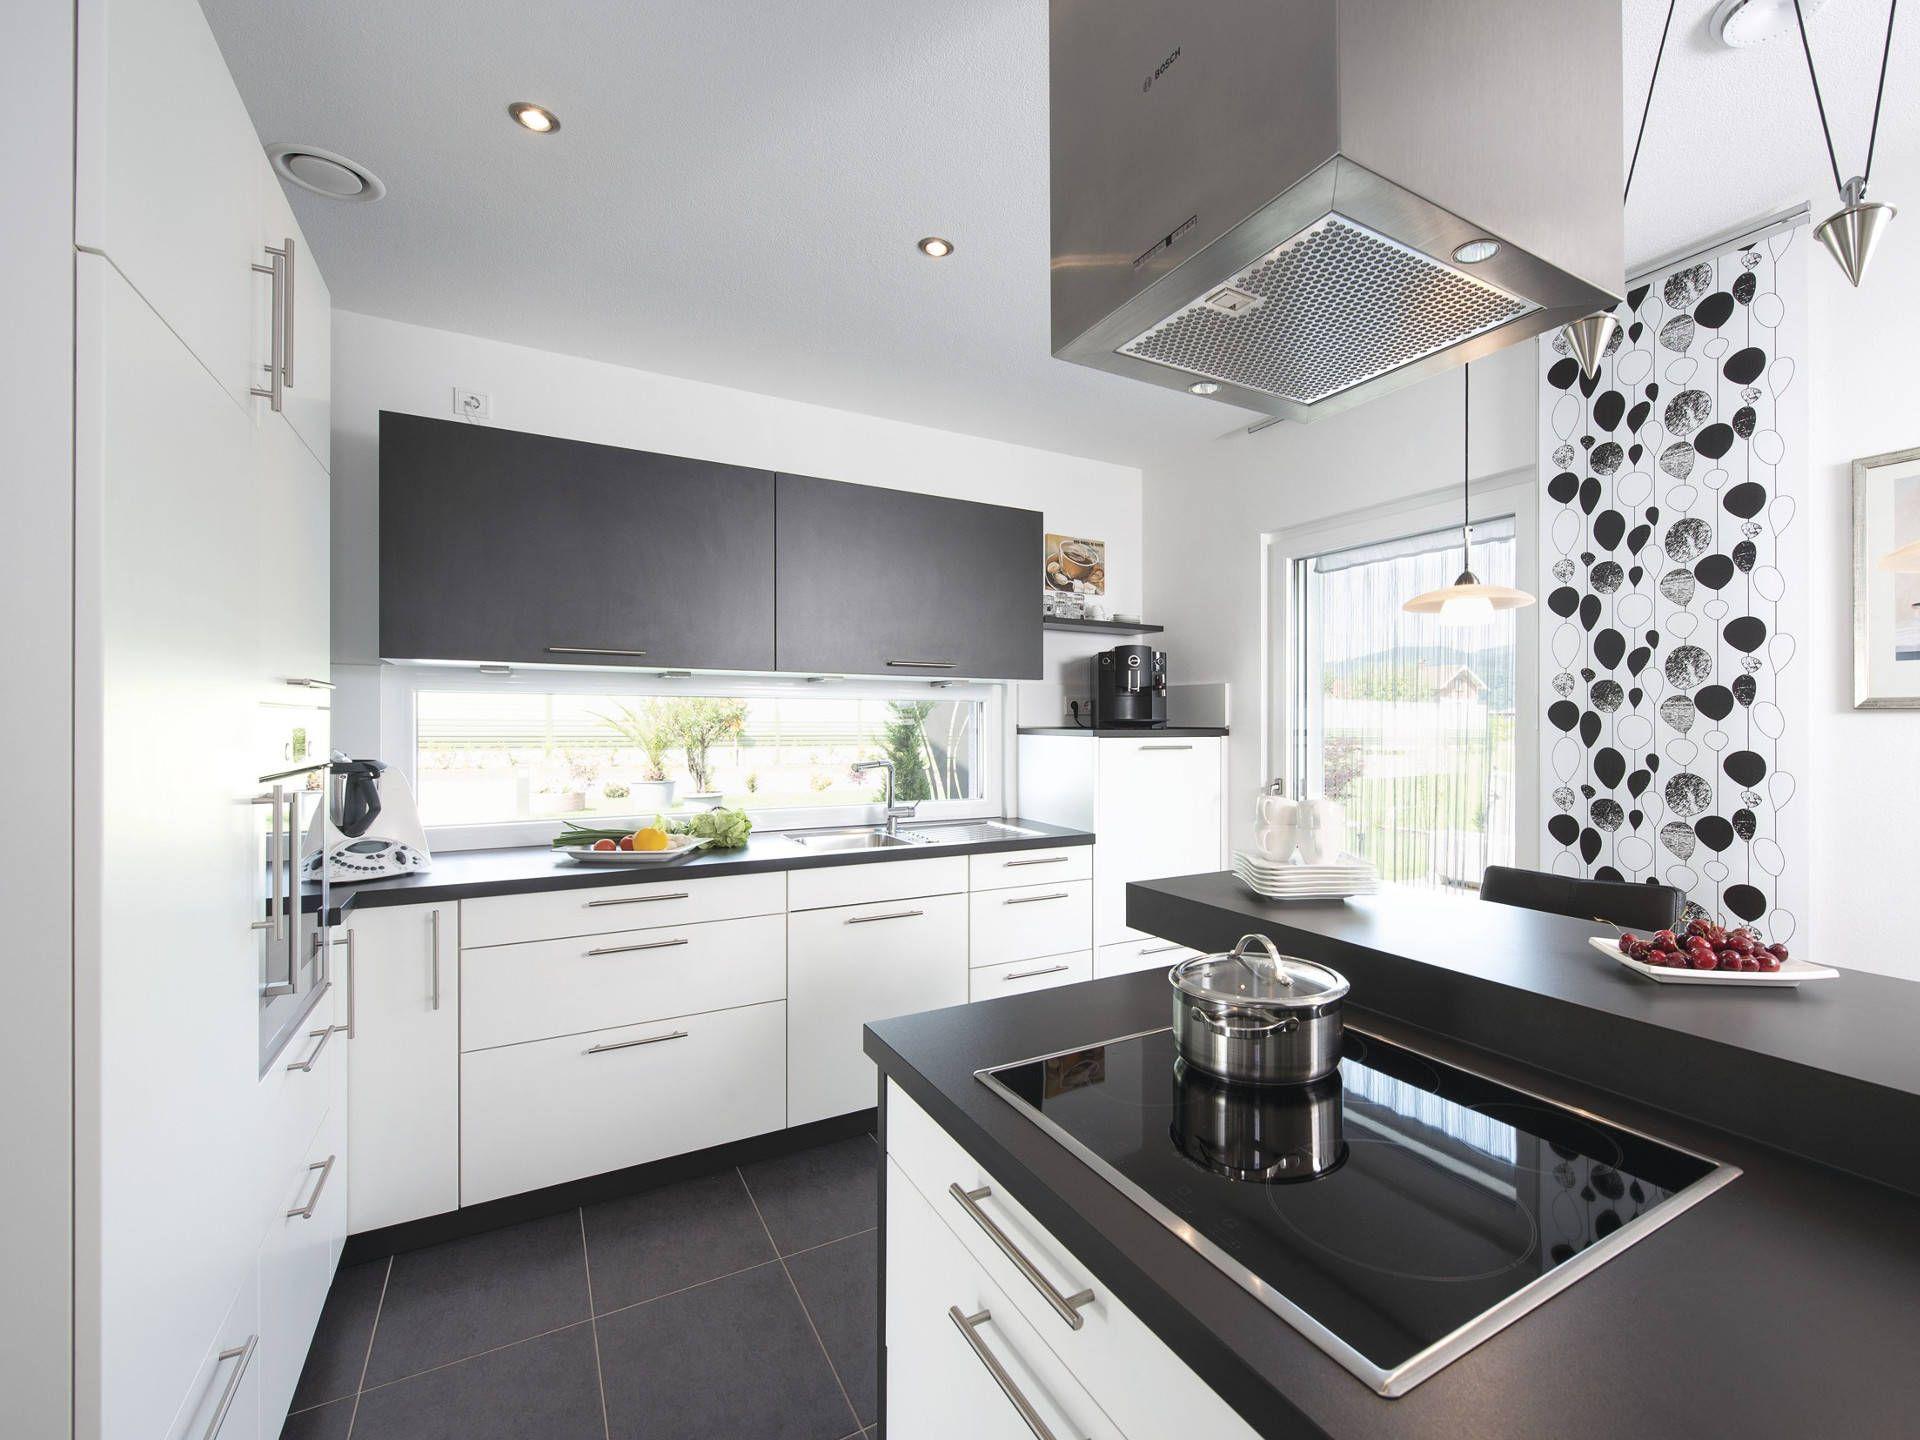 Superb Nobilia Gl nzende Perspektiven K che Lux Lack Seidengrau Design K chen g nstig kaufen Innova kitchen Pinterest